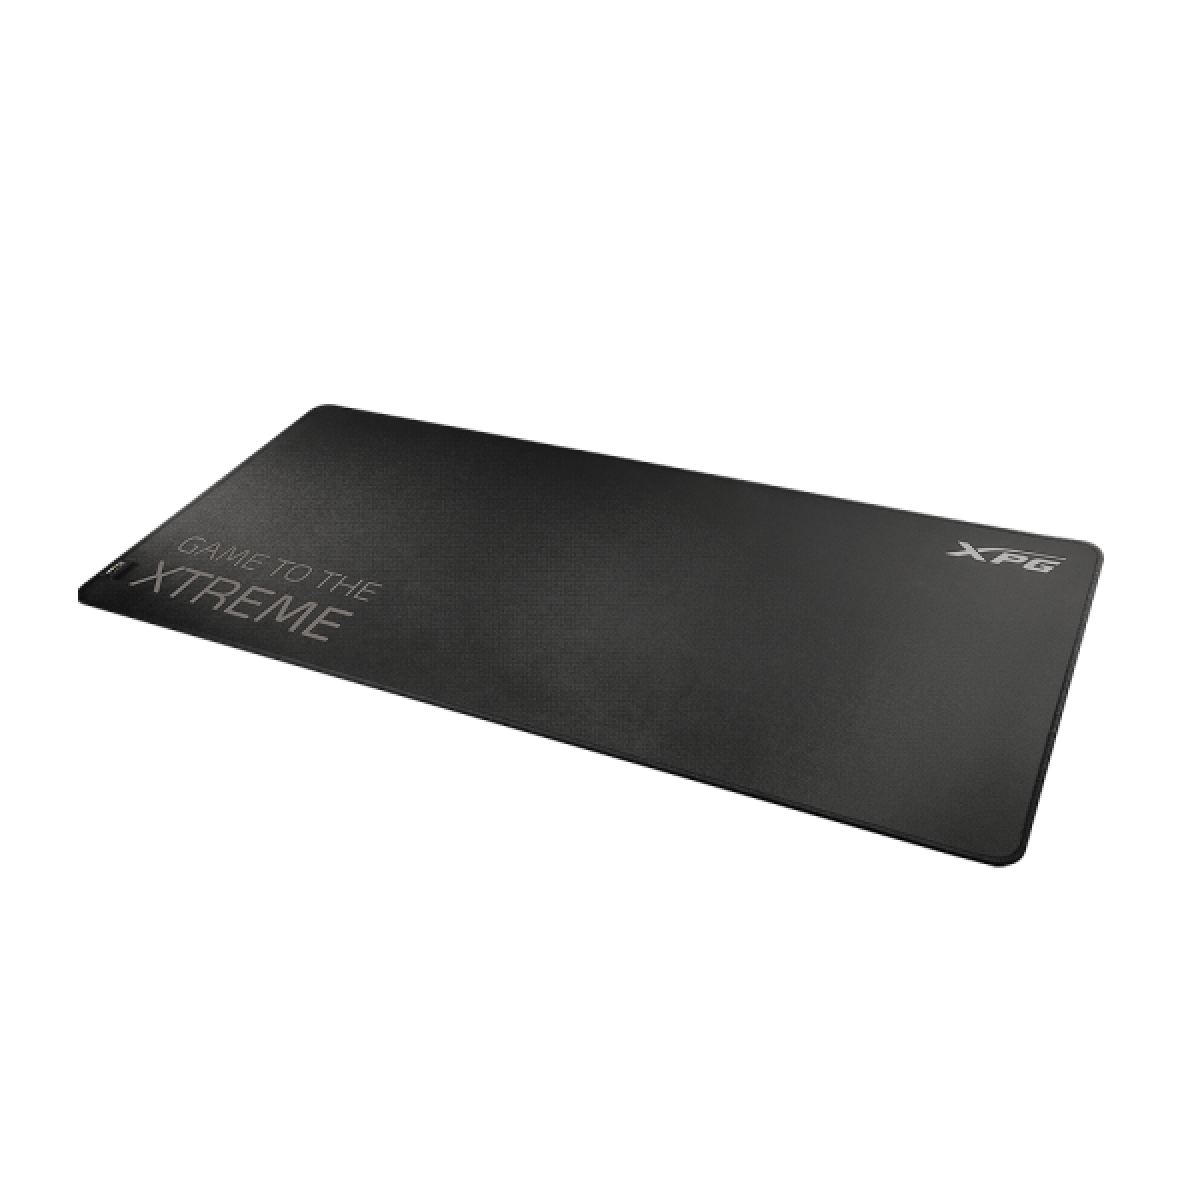 Mousepad Gamer XPG, BattleGround XL, XG, 940x420mm, Black, BATTLEGROUNDXL-BKCWW